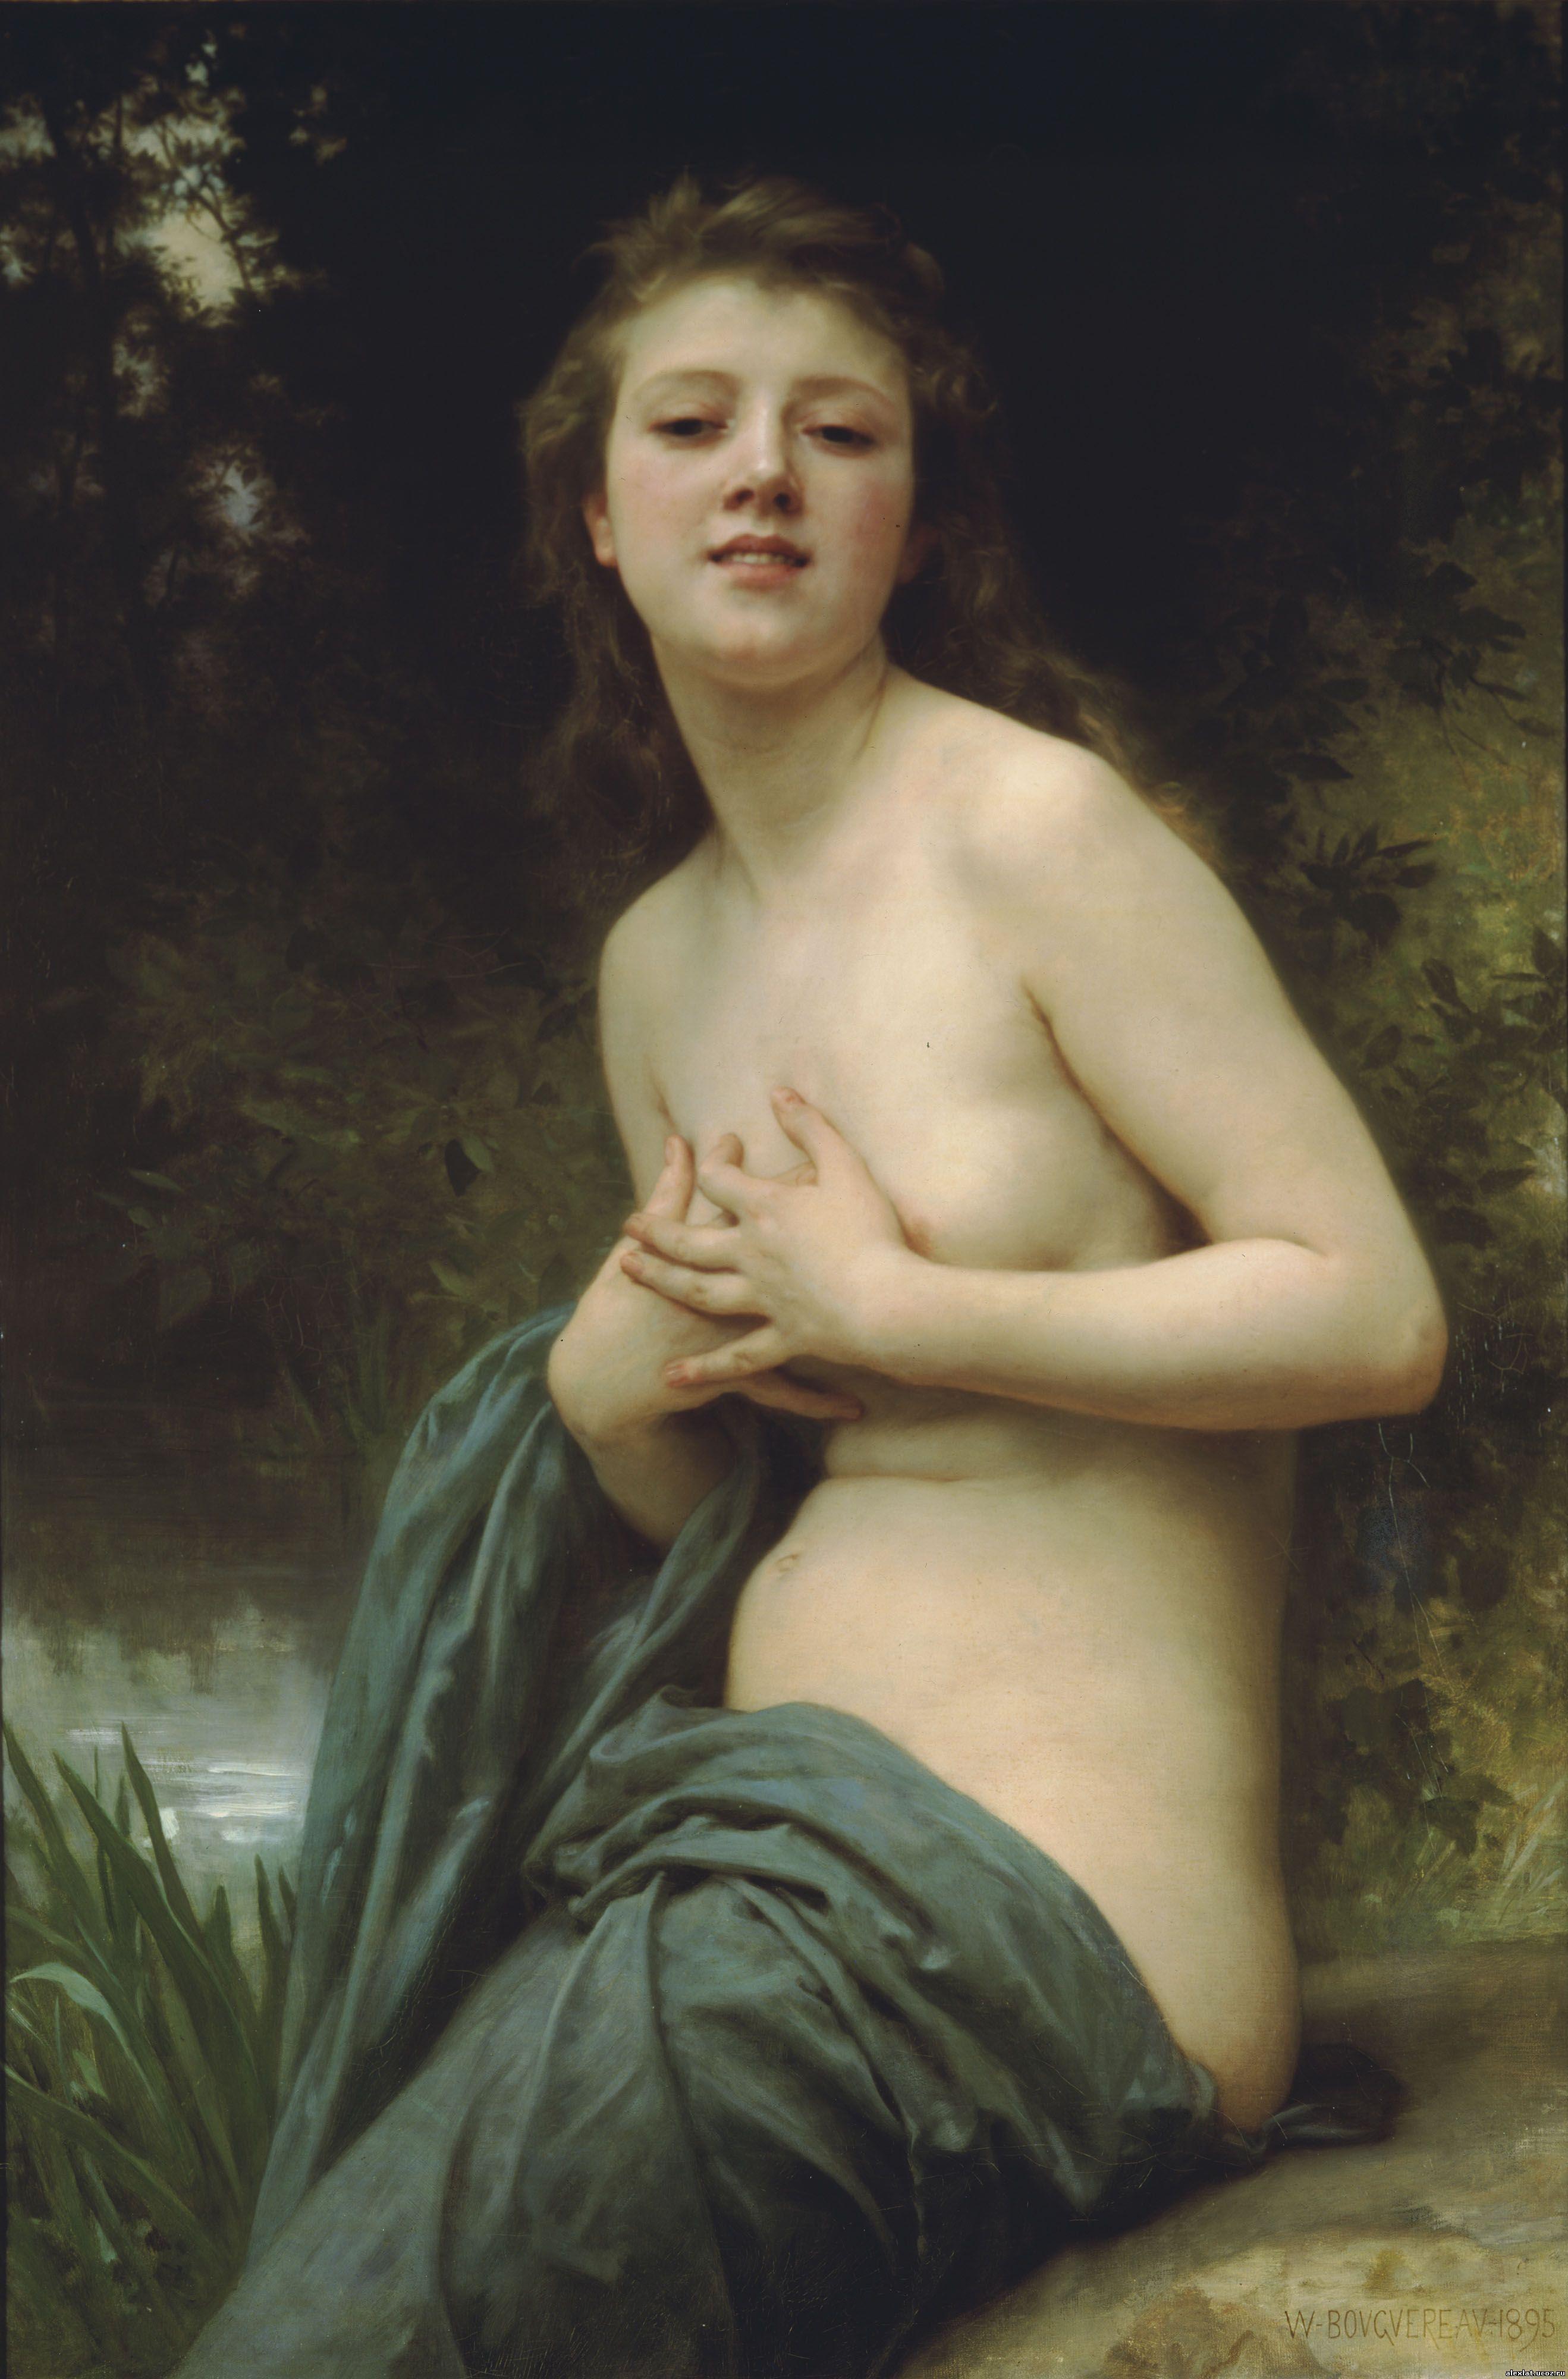 Alison angel car wash nude